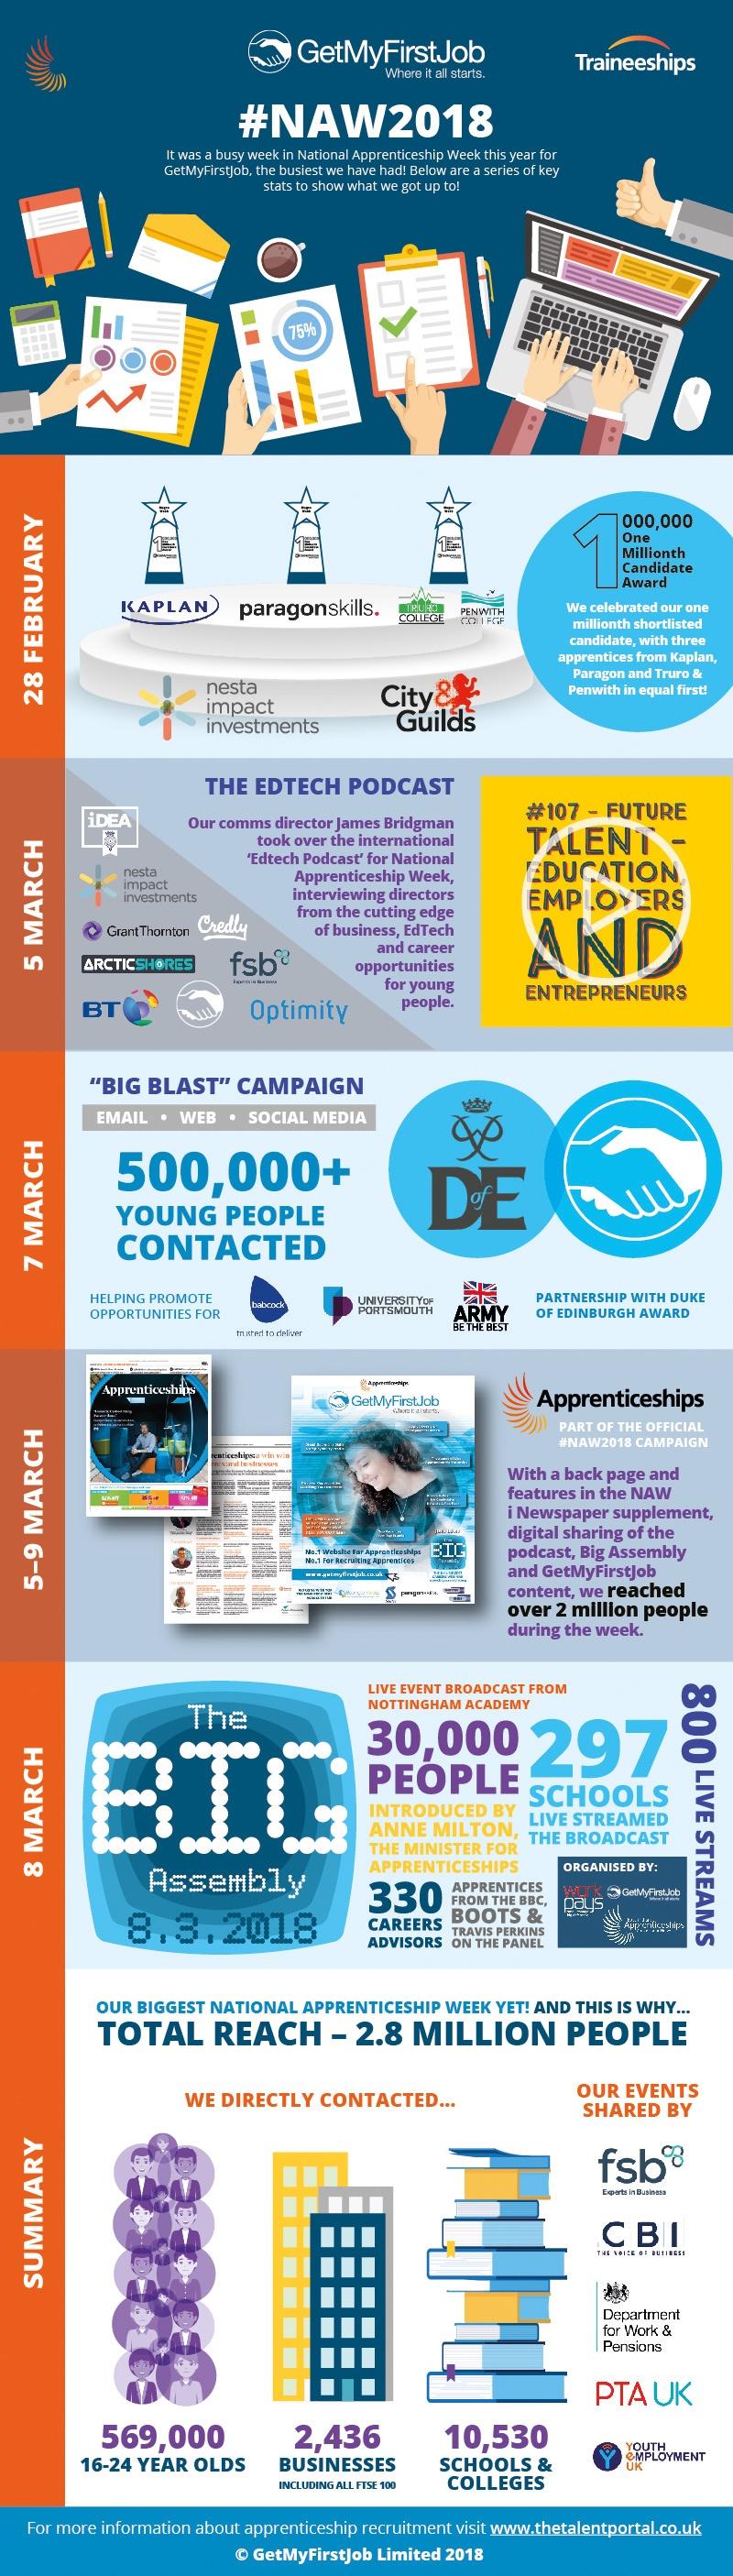 NAW2018 Infographic